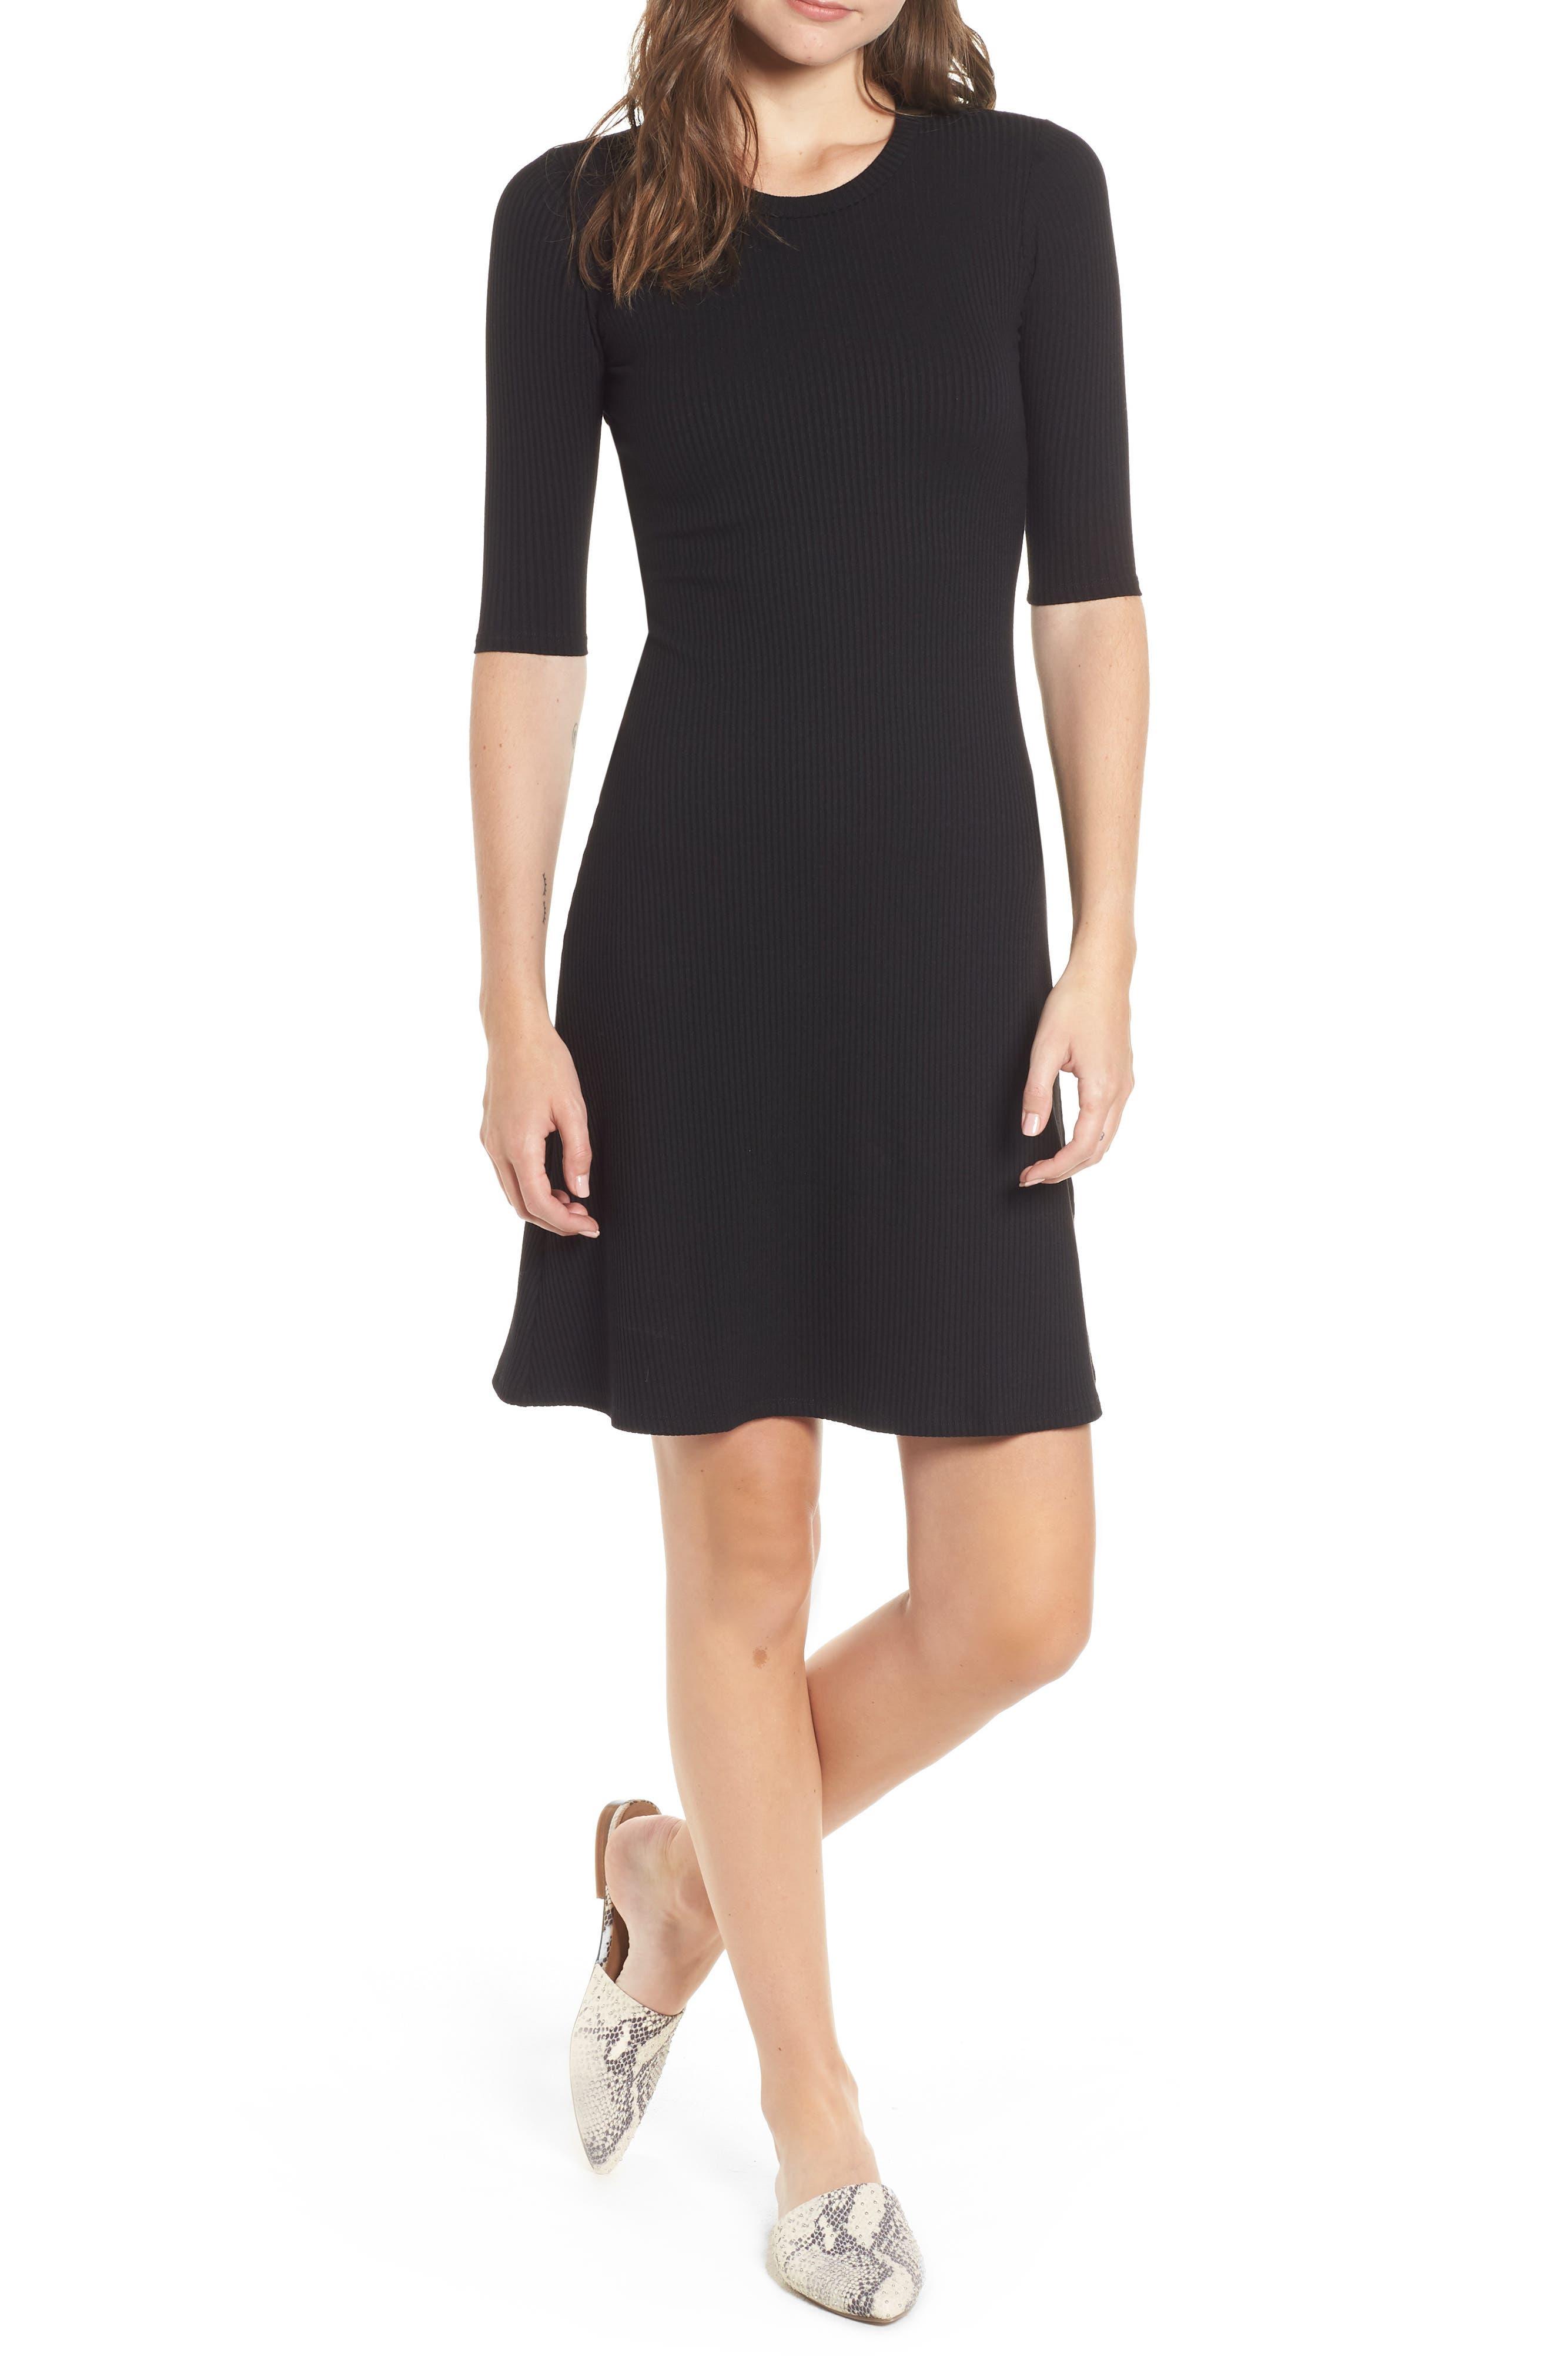 AMOUR VERT Marilyn Rib Fit & Flare Dress in Black